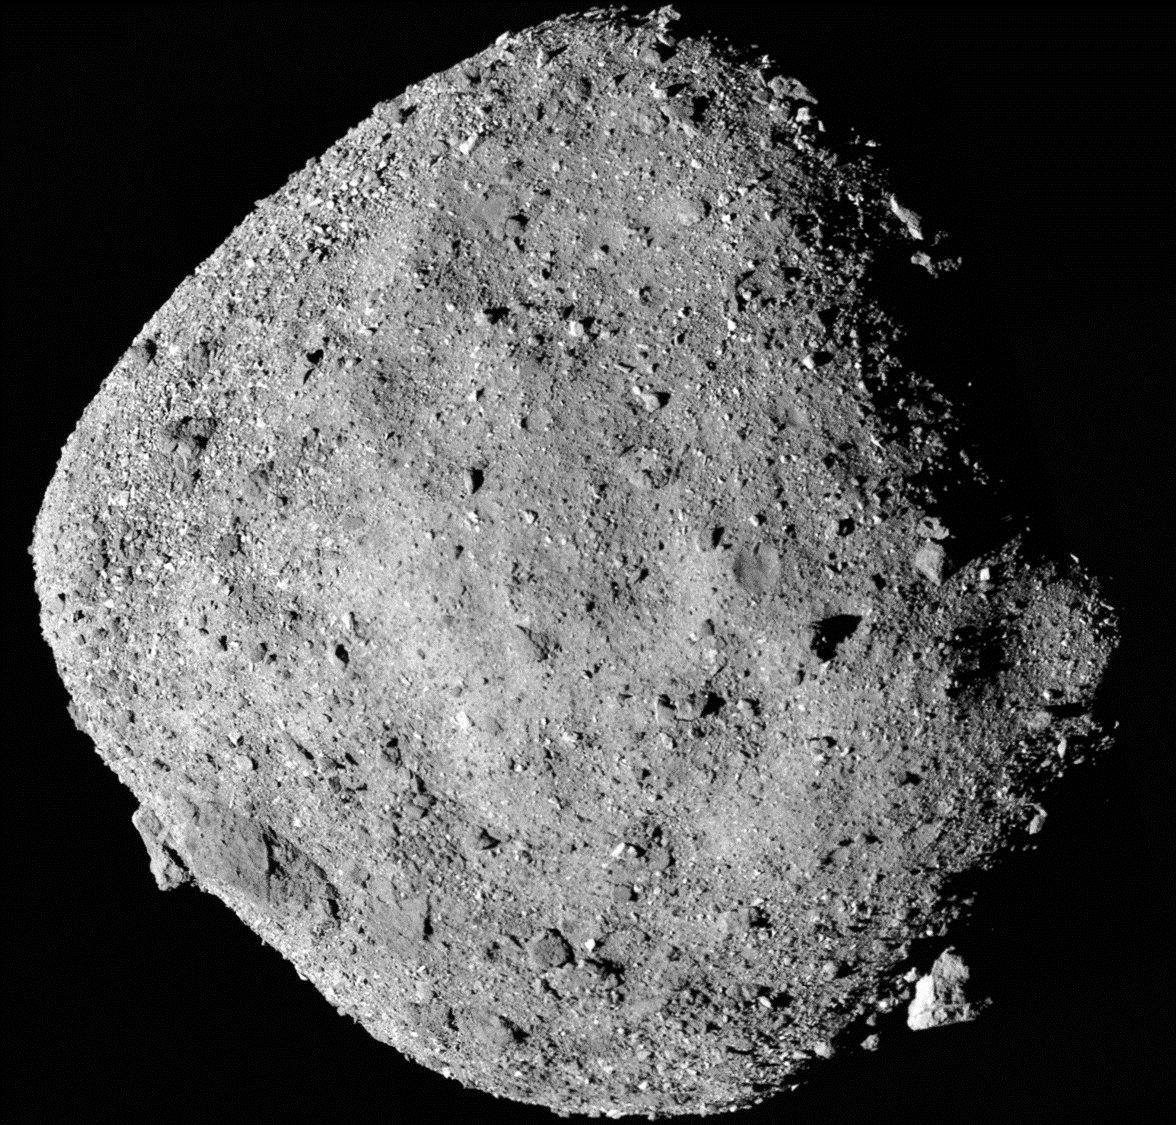 Una imagen de Bennu recogida por la sondaOSIRIS-REx (NASA/Goddard/University of Arizona via REUTERS)